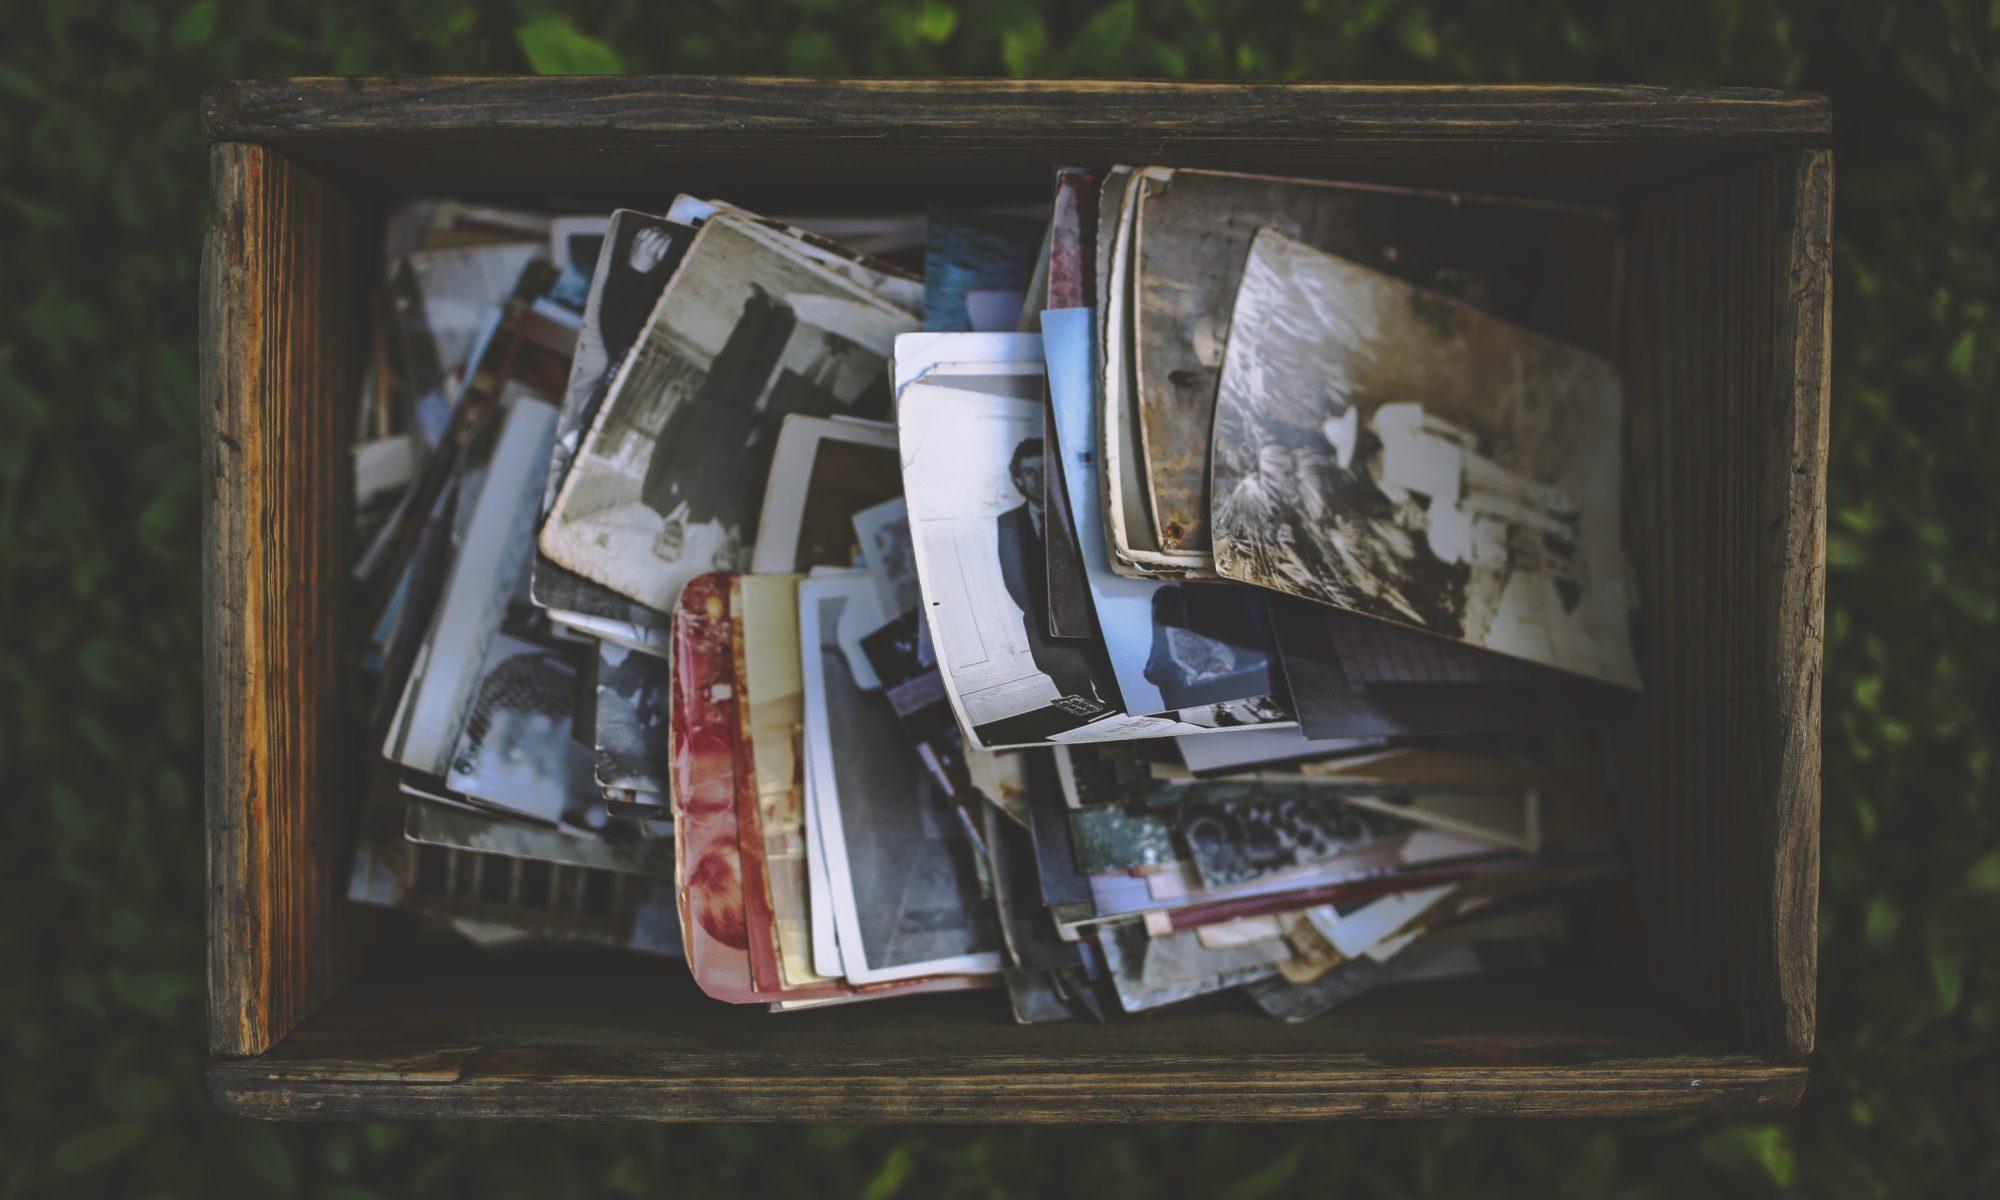 box-memories-nostalgic-5842